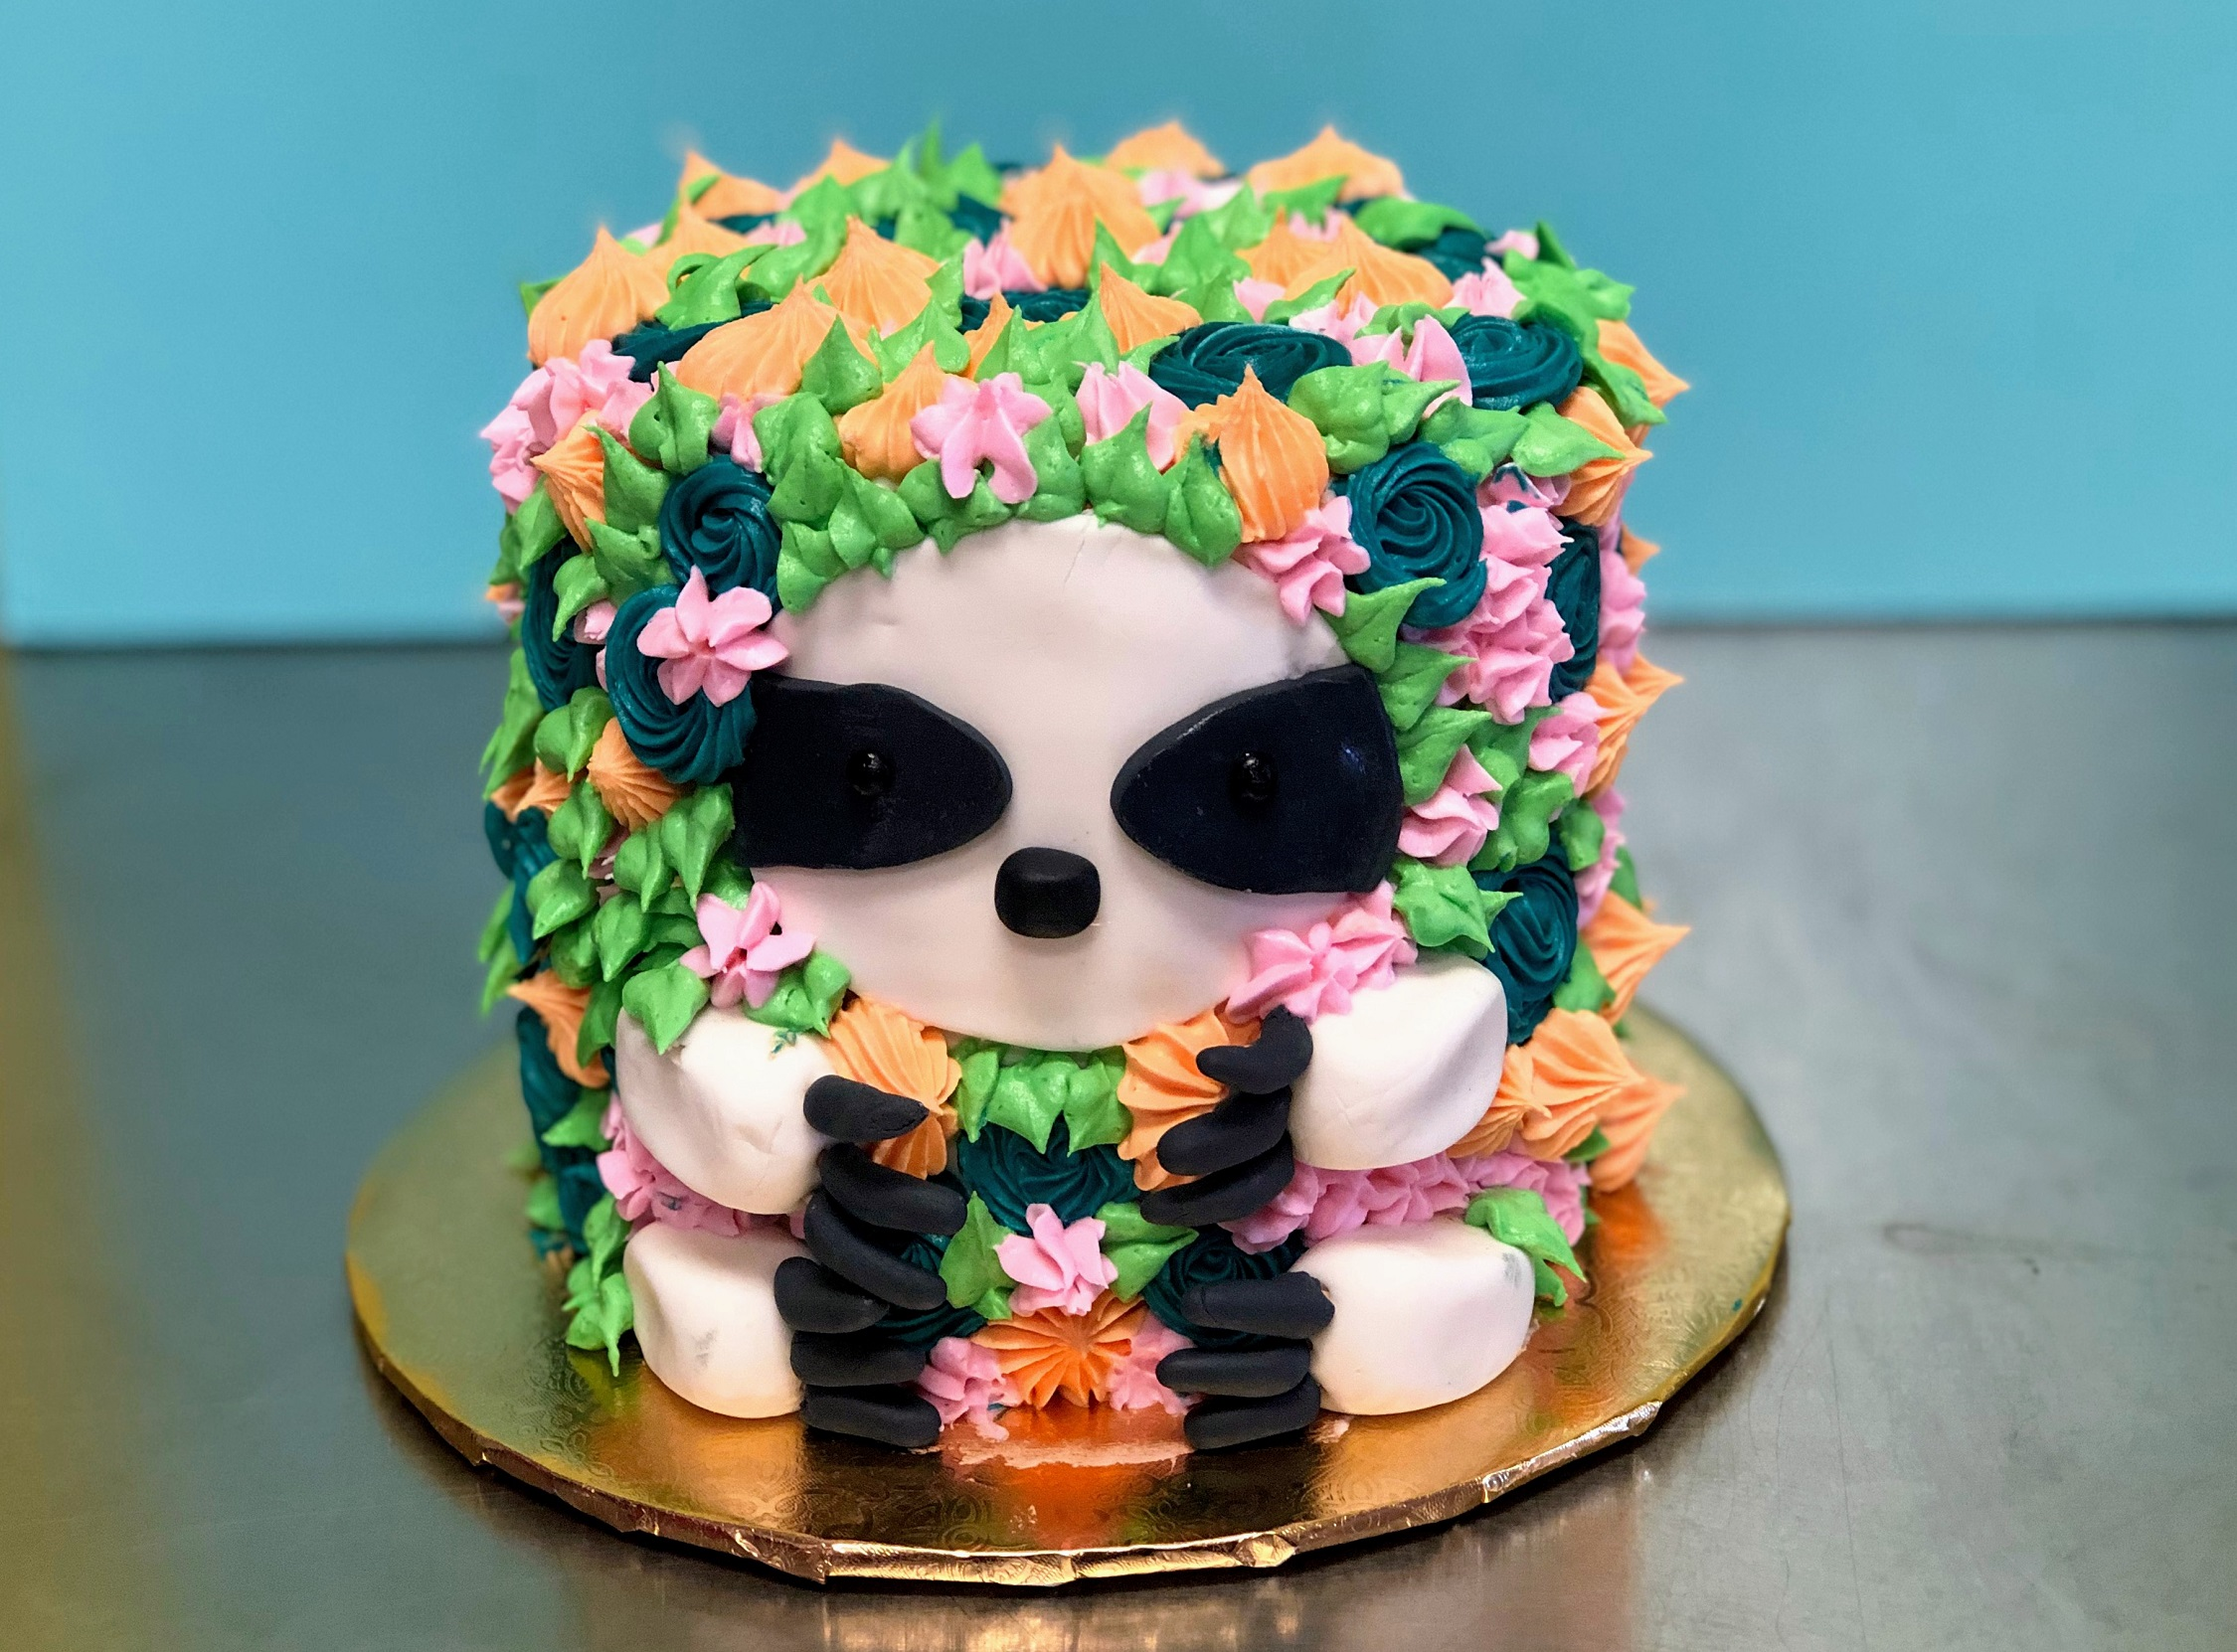 Wine Down Wednesday: Sloth Cake